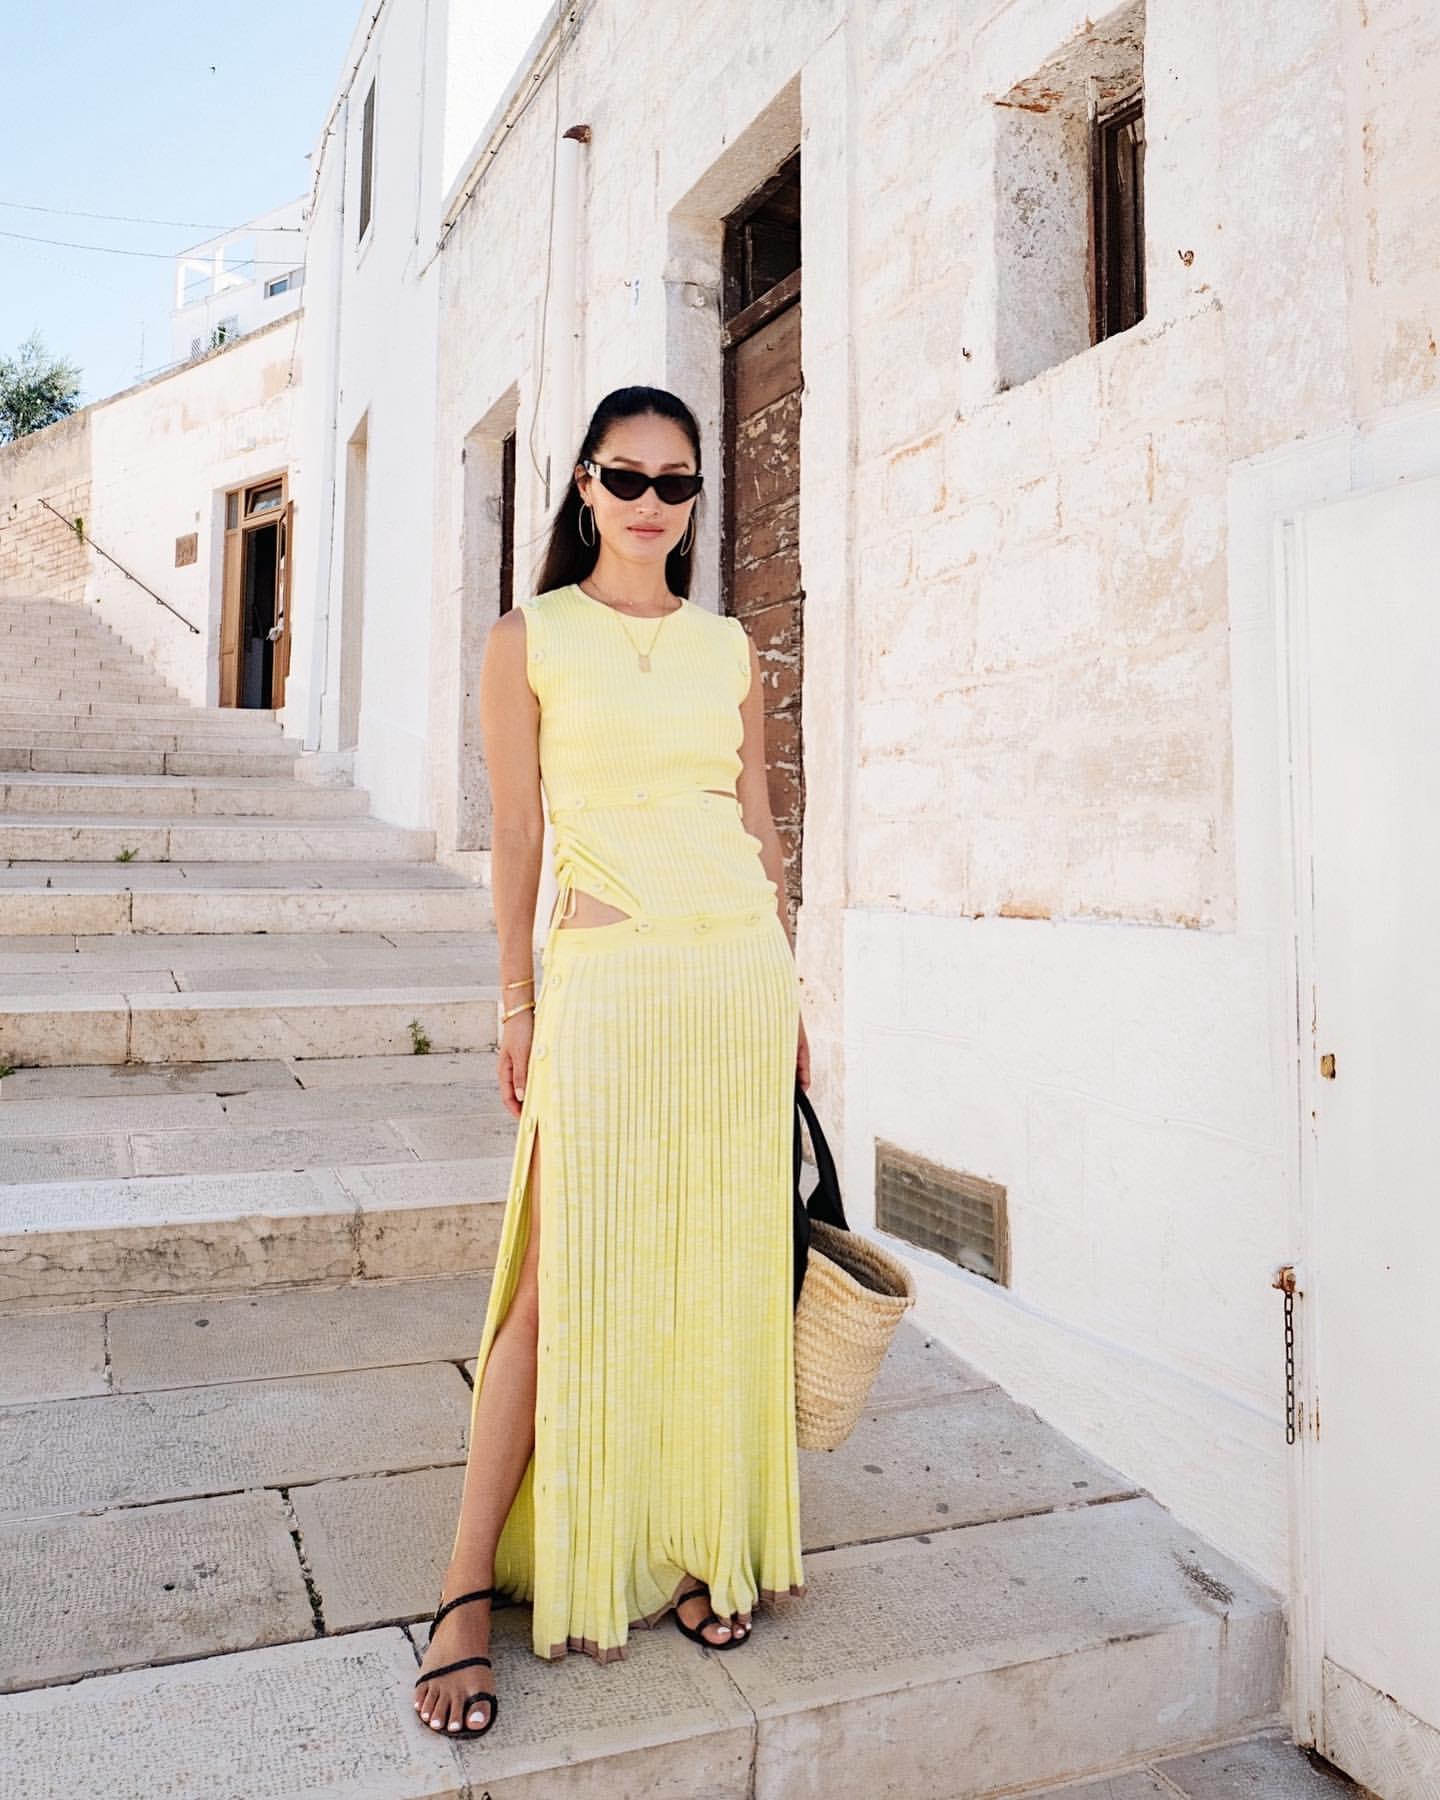 Warne Shadbolt merges in yellow dress